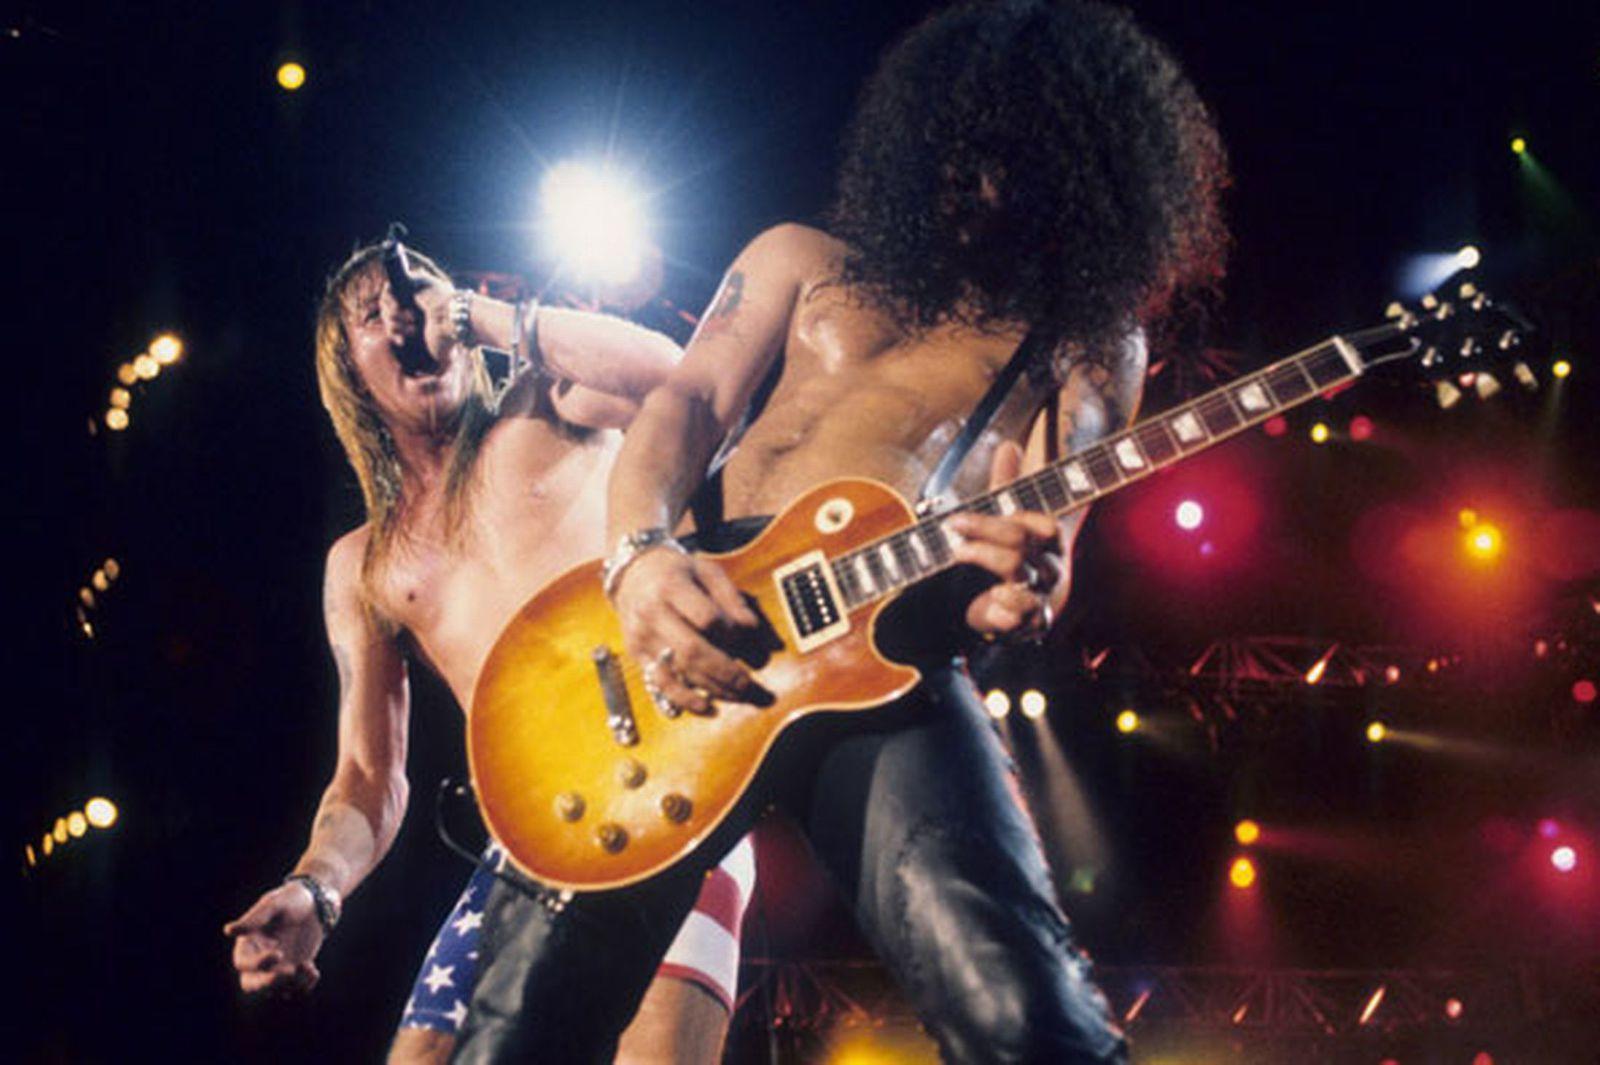 Slash - January 15, 1991 - Axl Rose and Slash of Guns N'Roses perform live at Rock In Rio II